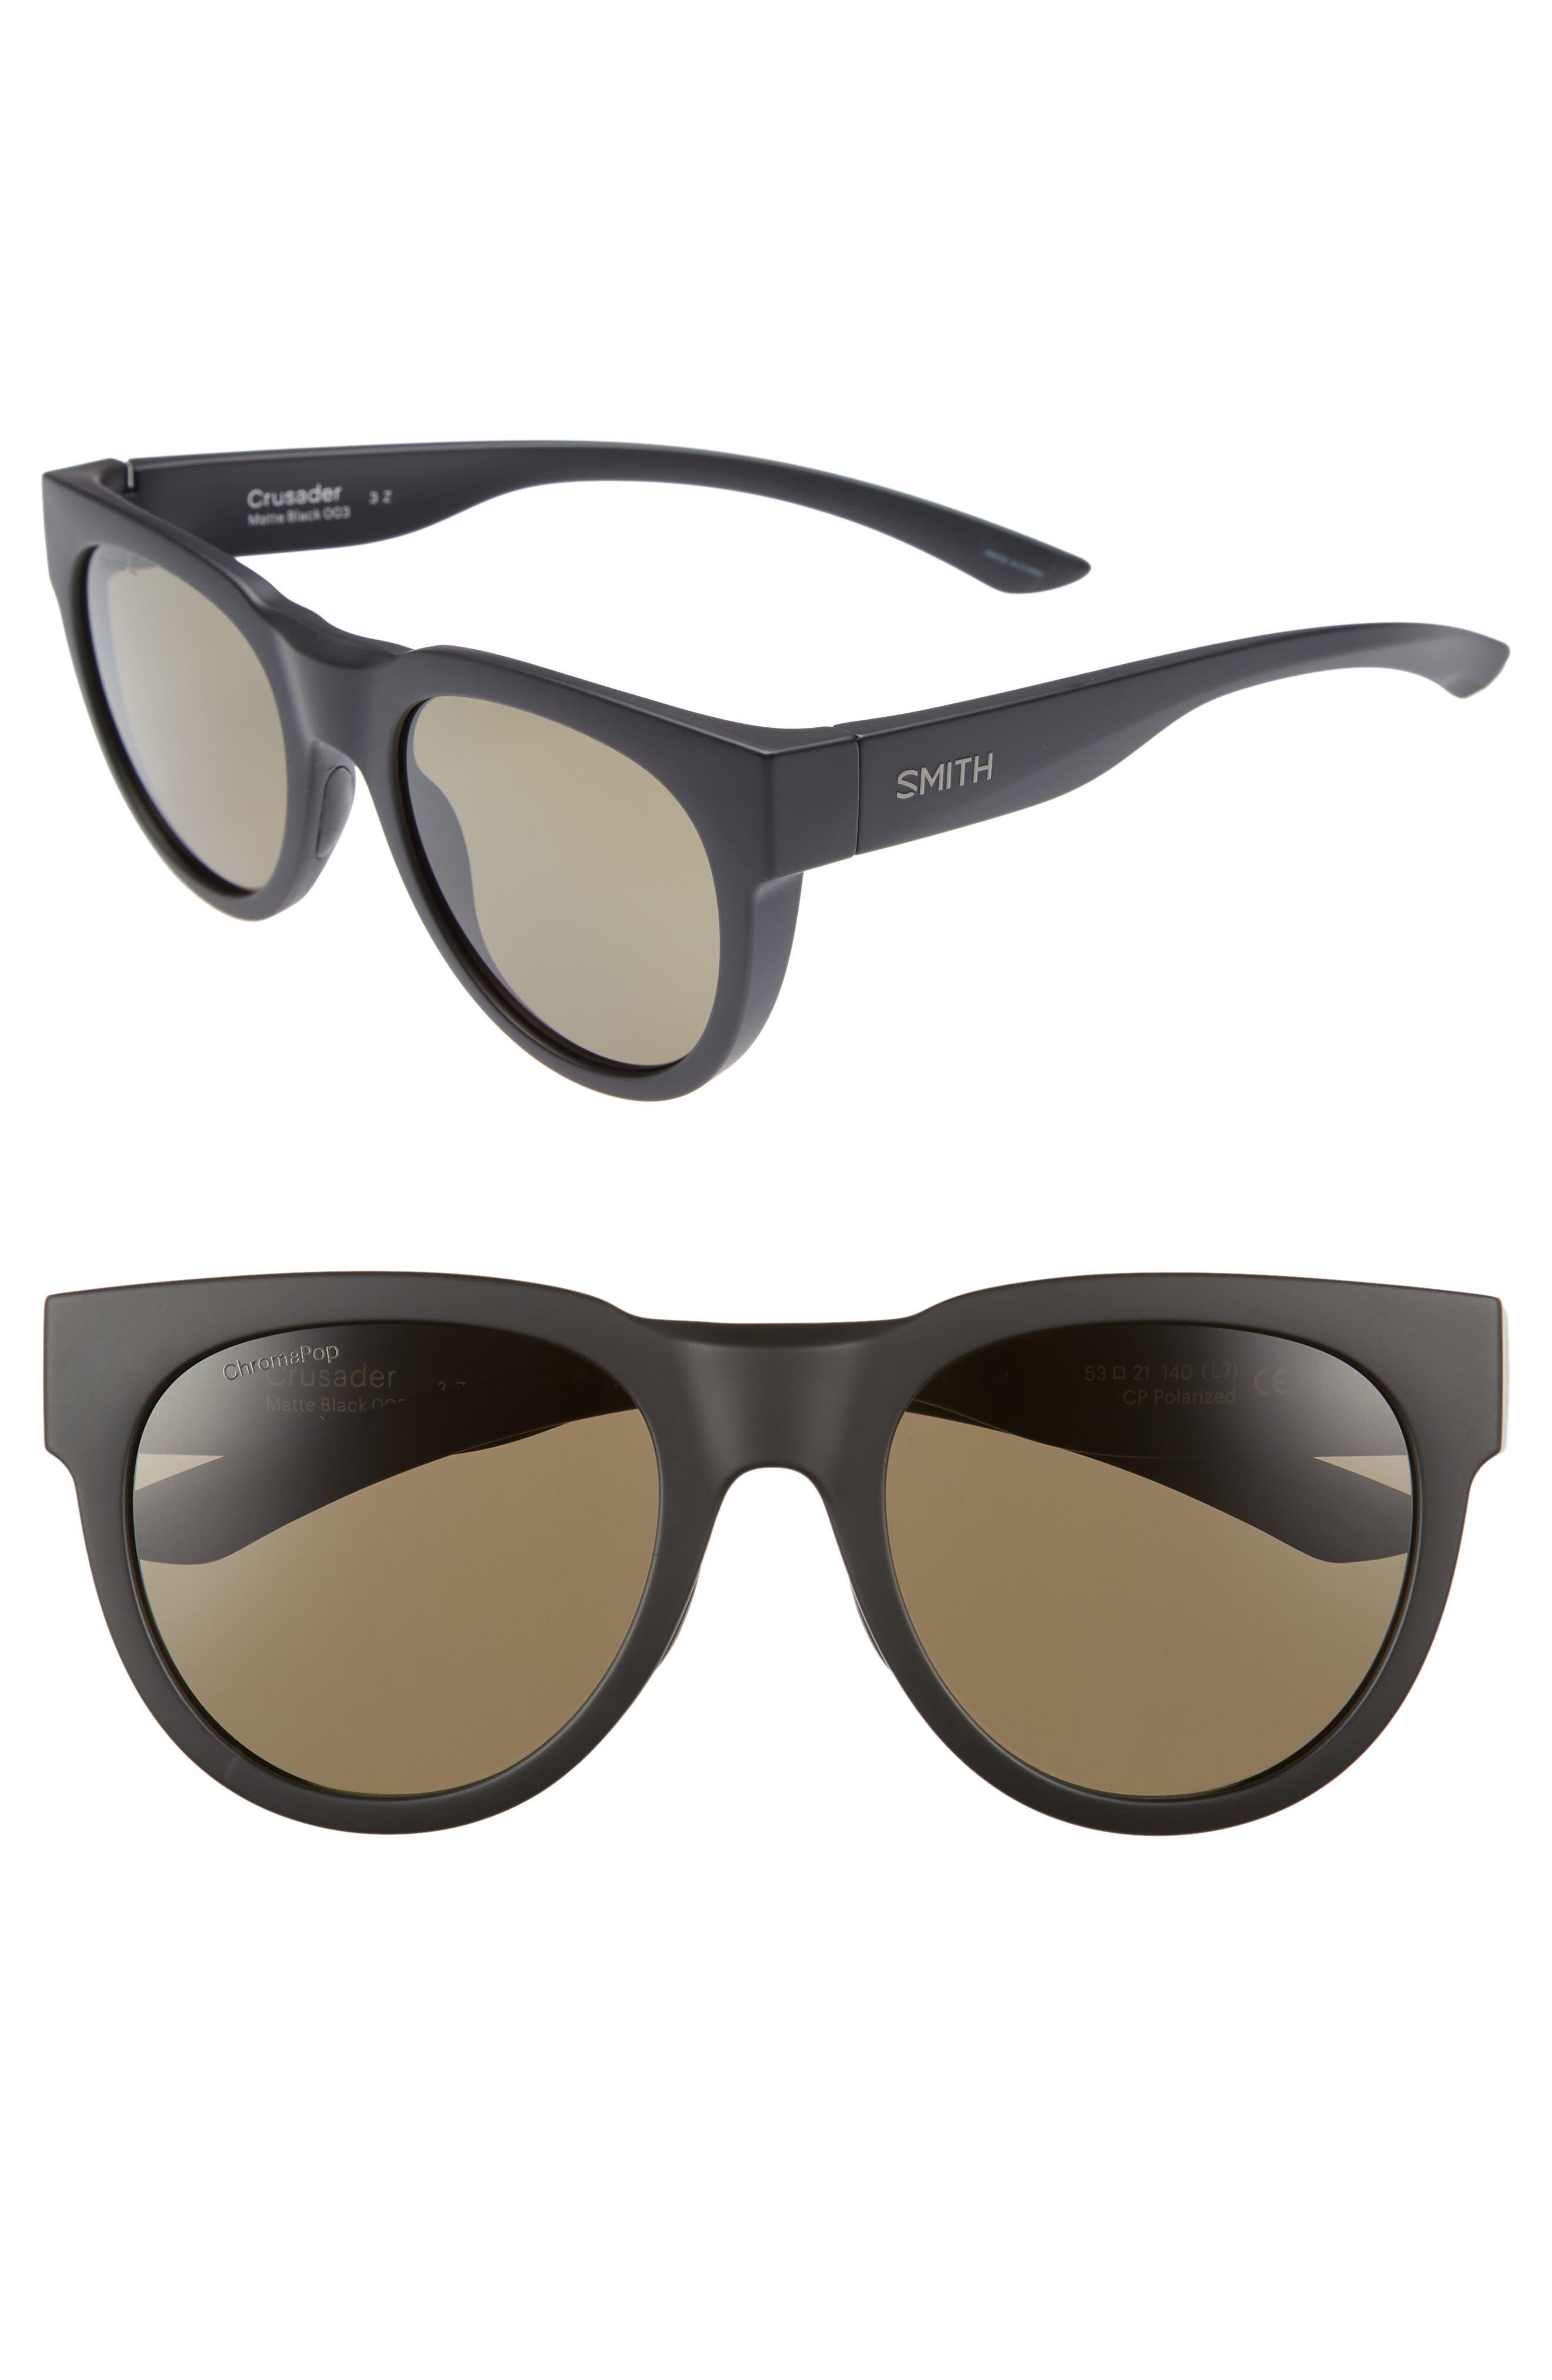 Crusader 53mm ChromaPop<sup>™</sup> Round Sunglasses,                             Main thumbnail 1, color,                             MATTE BLACK